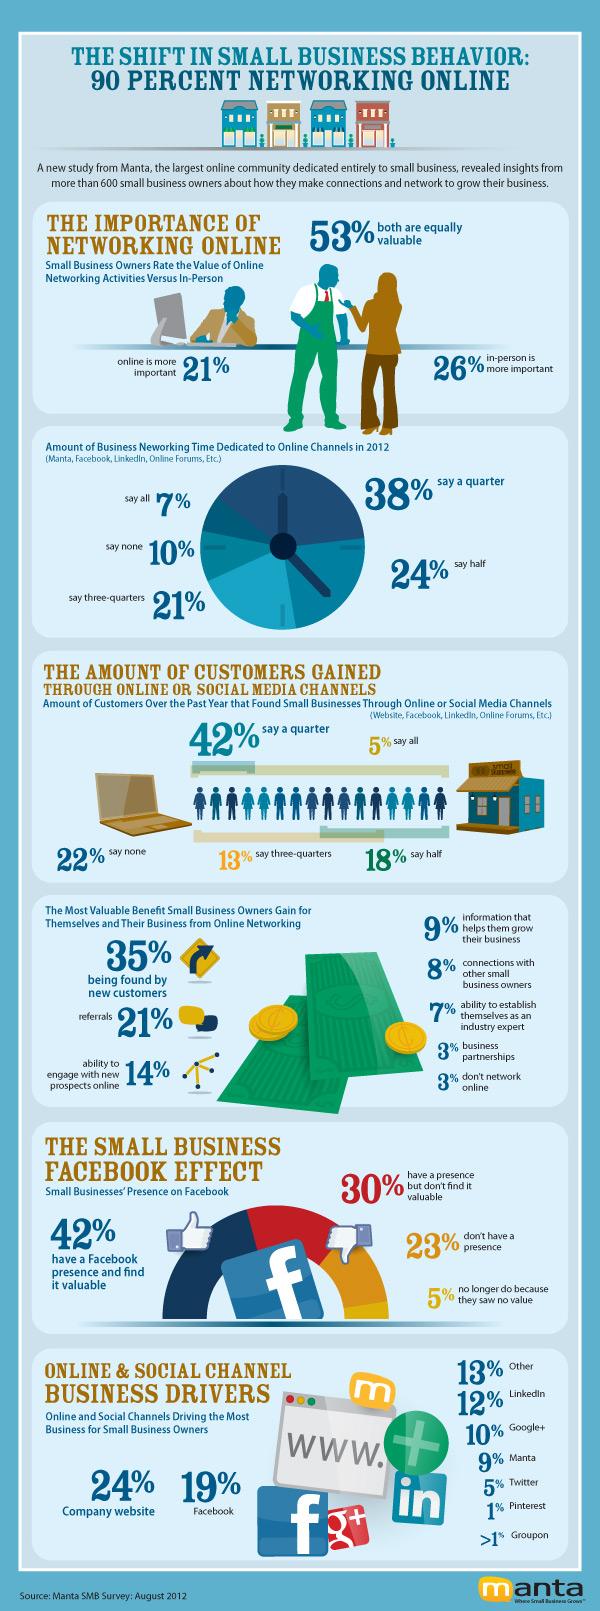 Manta SMB Survey Infographic_final